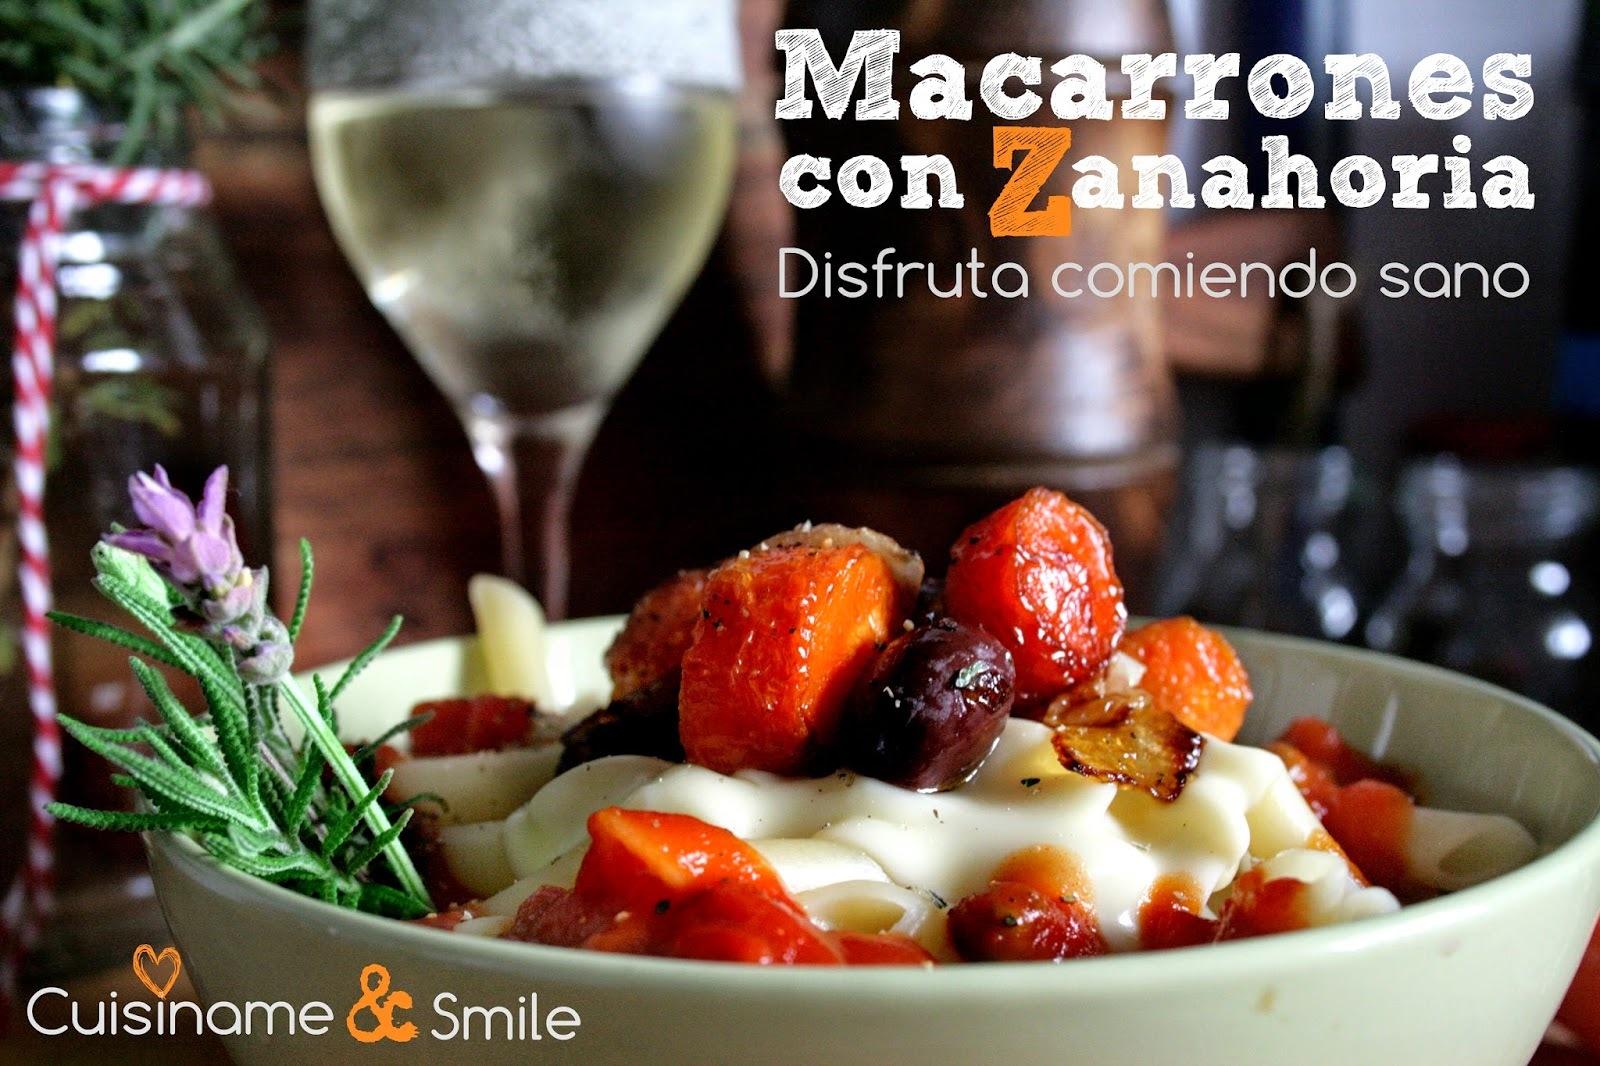 Macarrones con Queso | Macarrones al Horno con Zanahorias